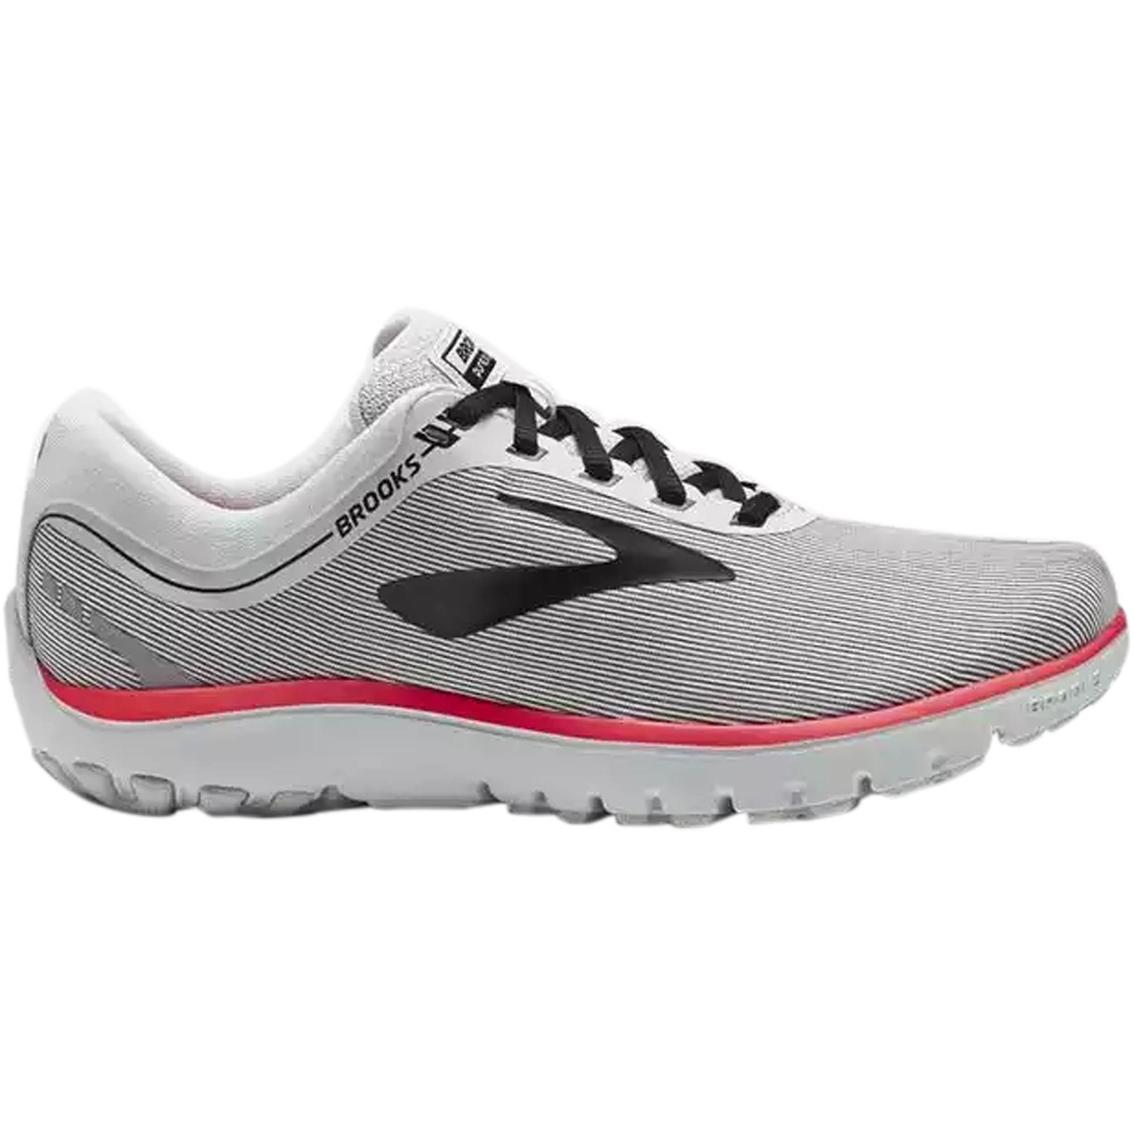 04b1aace85595 Brooks Women s Pureflow 7 Running Shoes